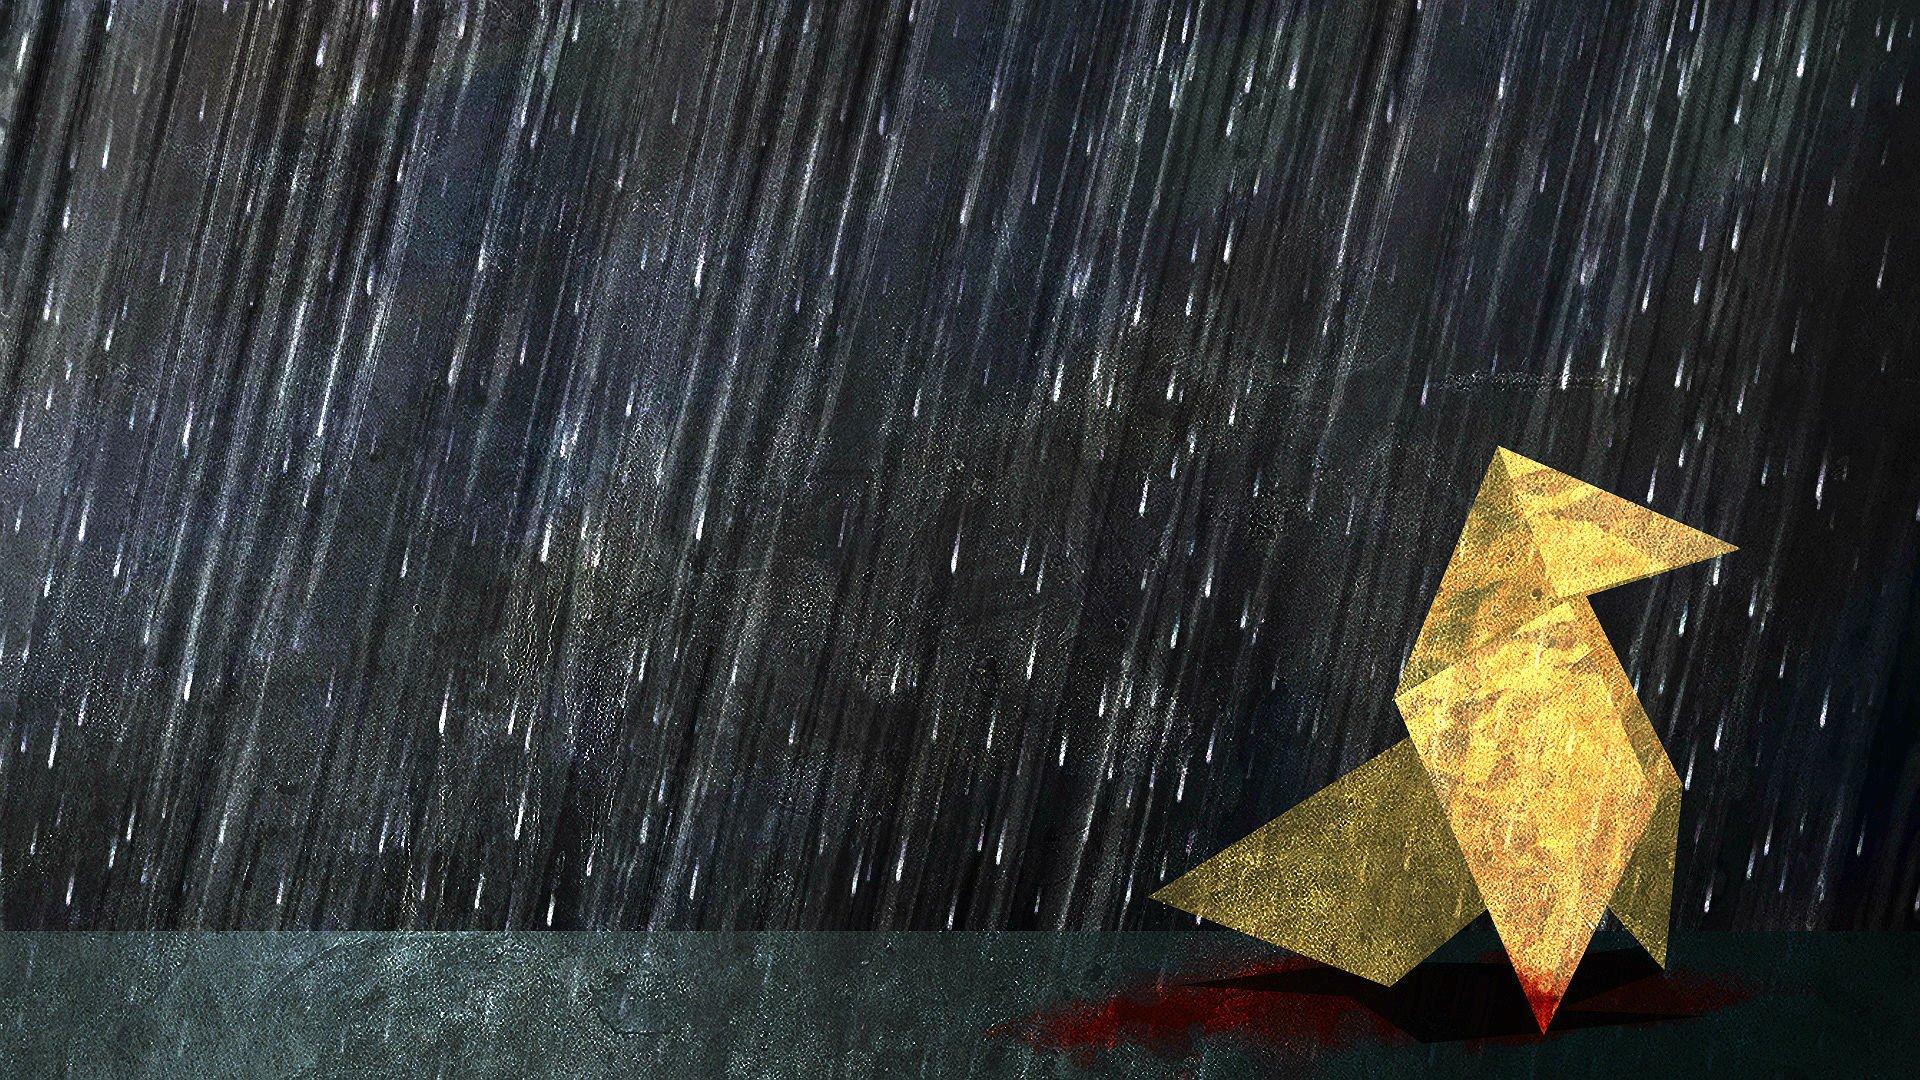 HEAVY RAIN drama action adventure noir thriller cinematic ...